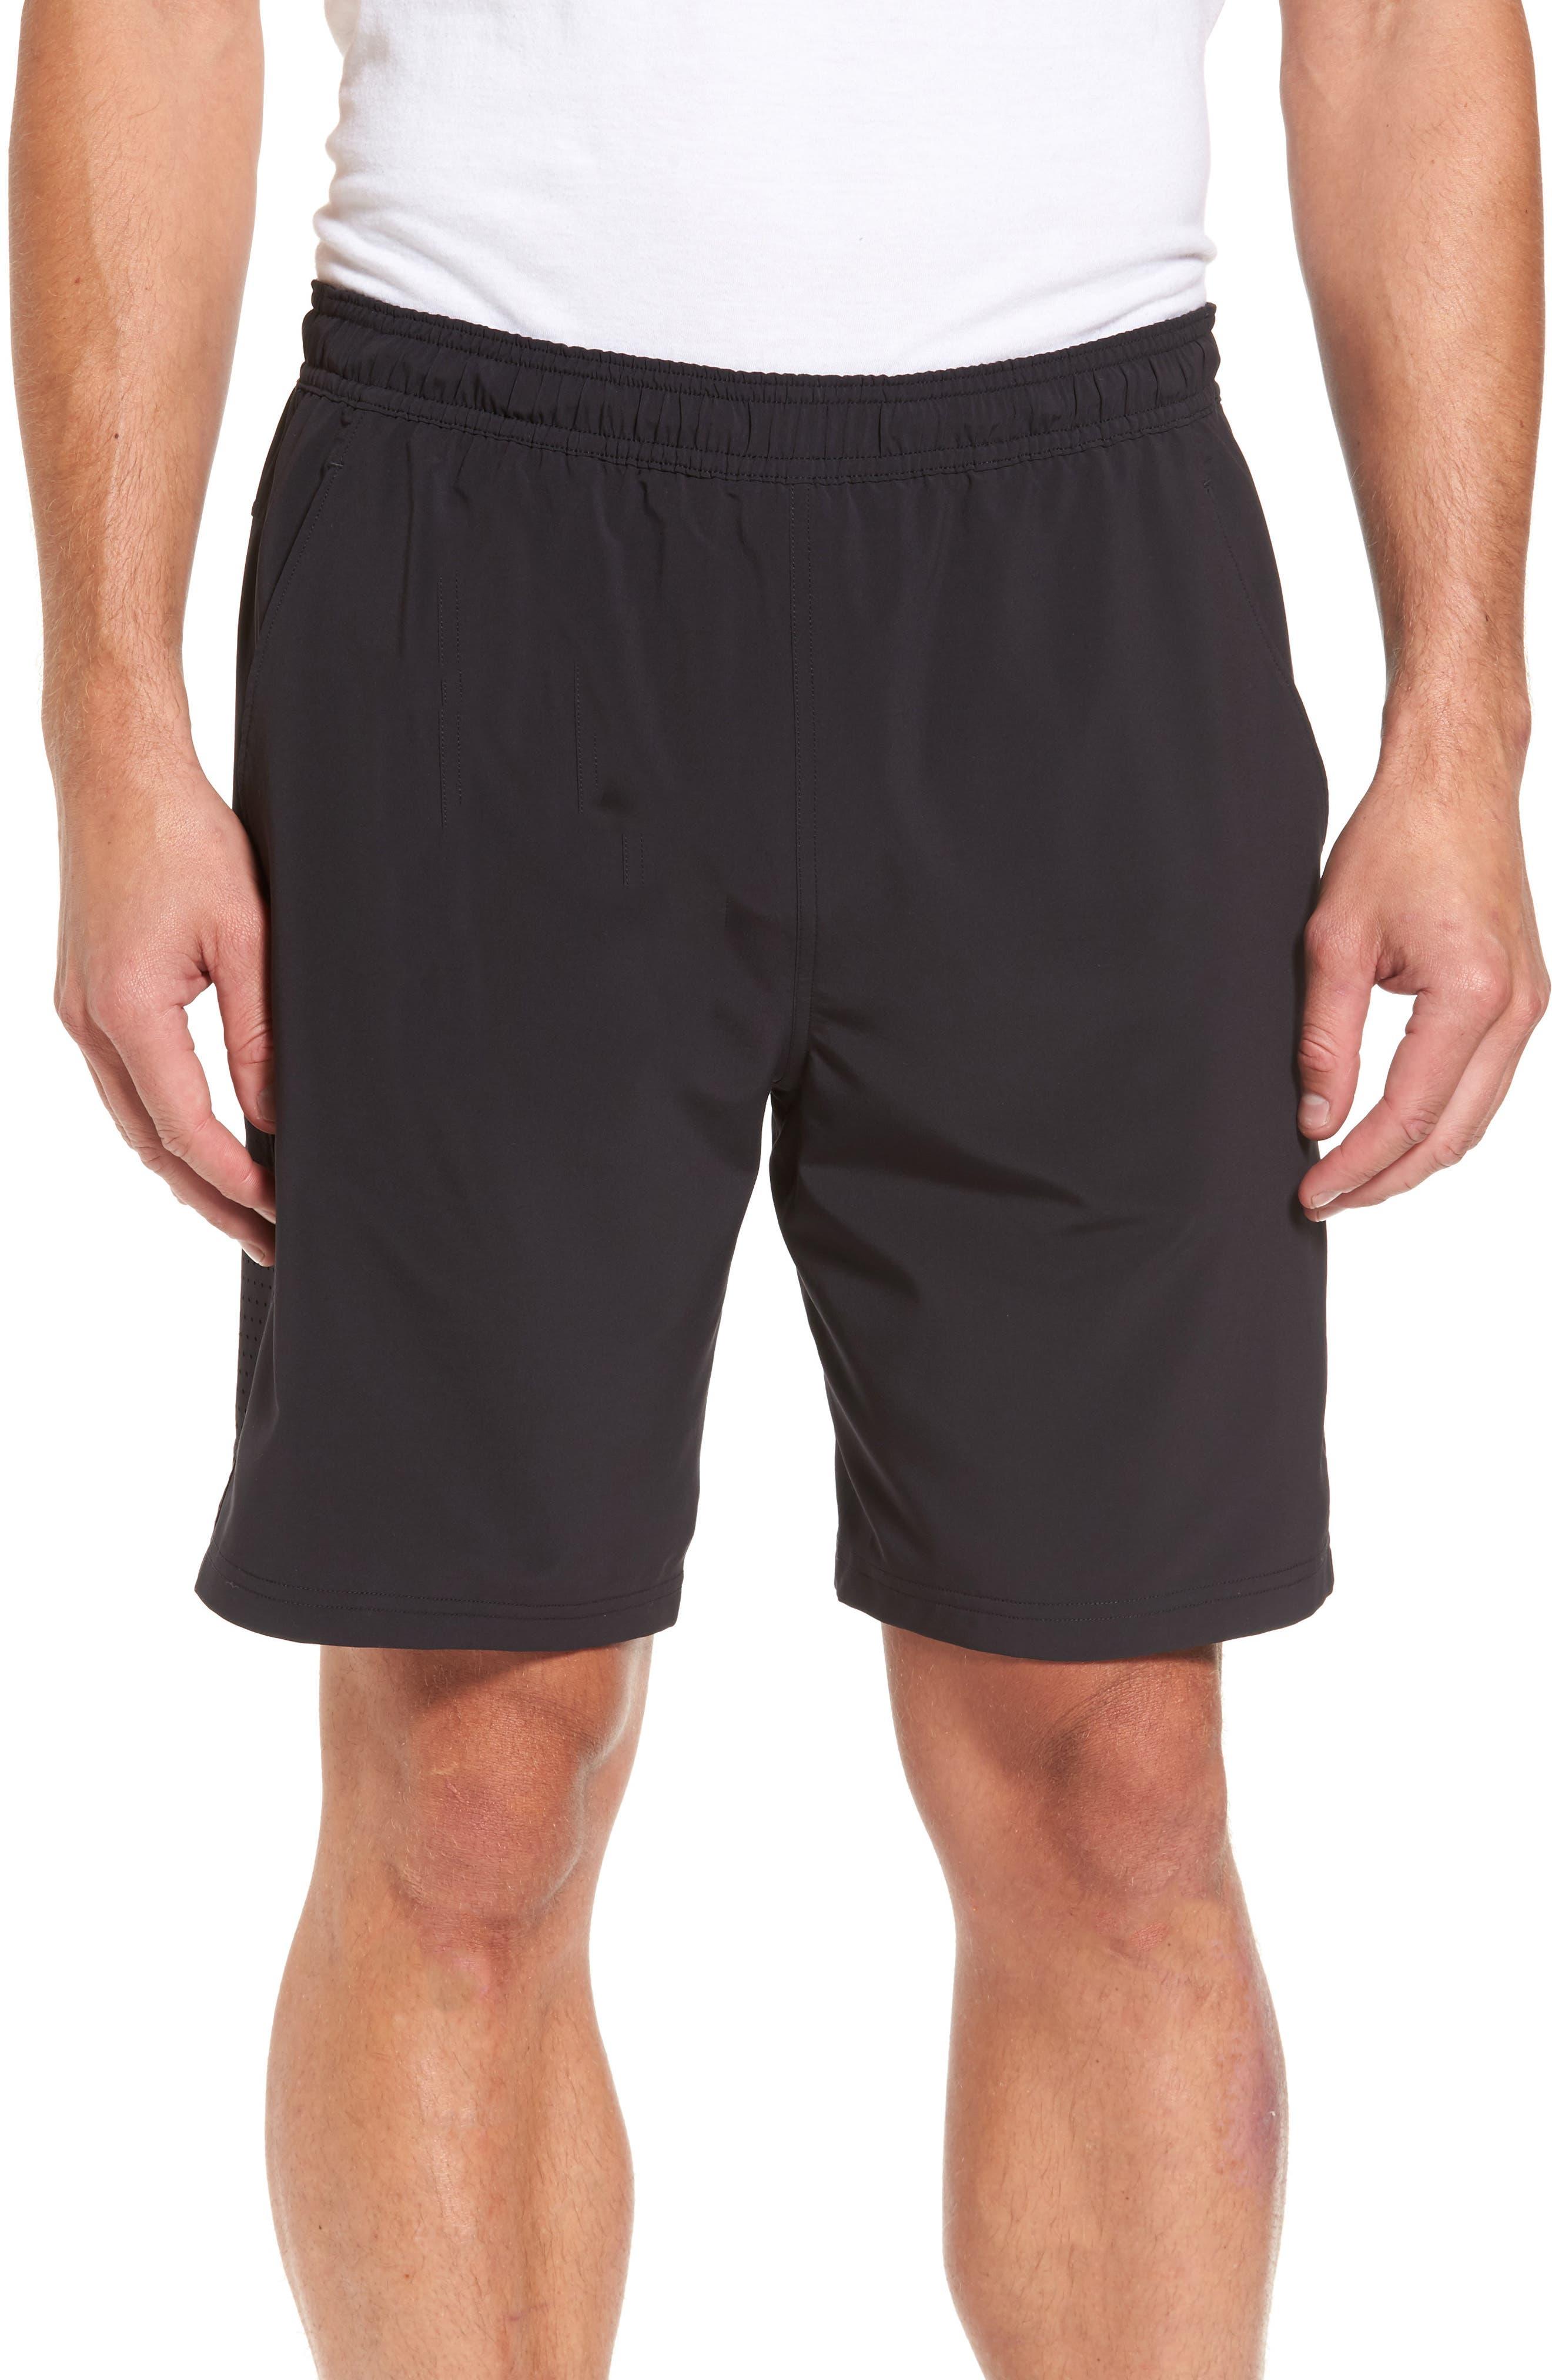 Main Image - Zella Graphite Core Athletic Shorts